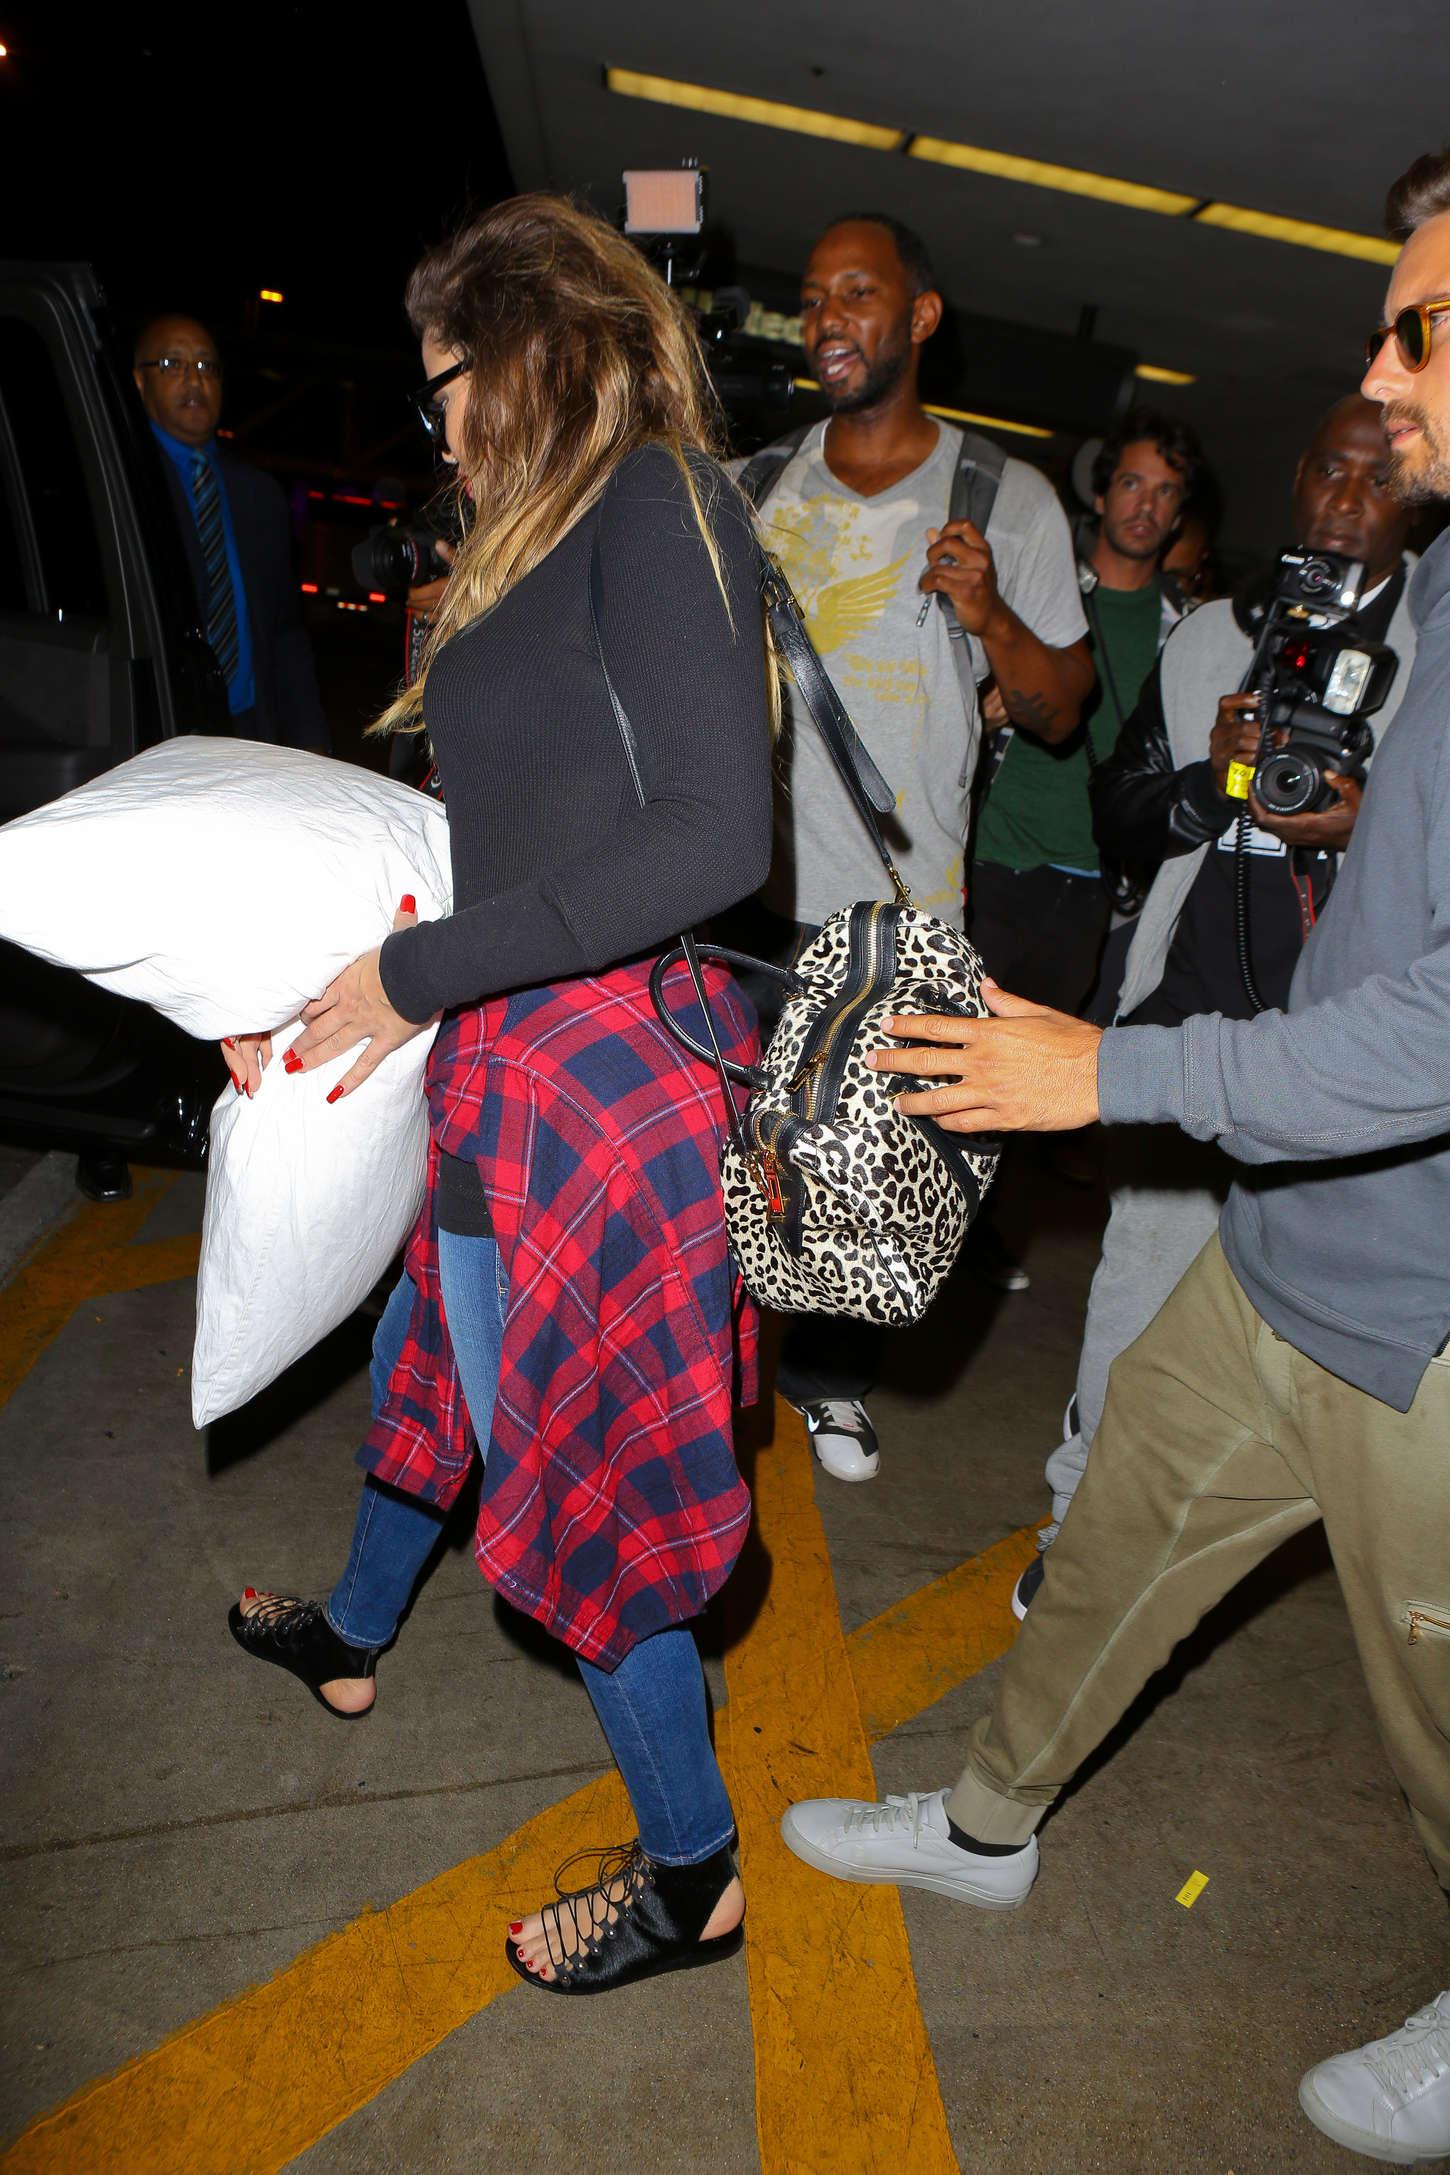 Khloe Kardashian 2014 : Khloe Kardashian with Scott Disick at LAX airport -09